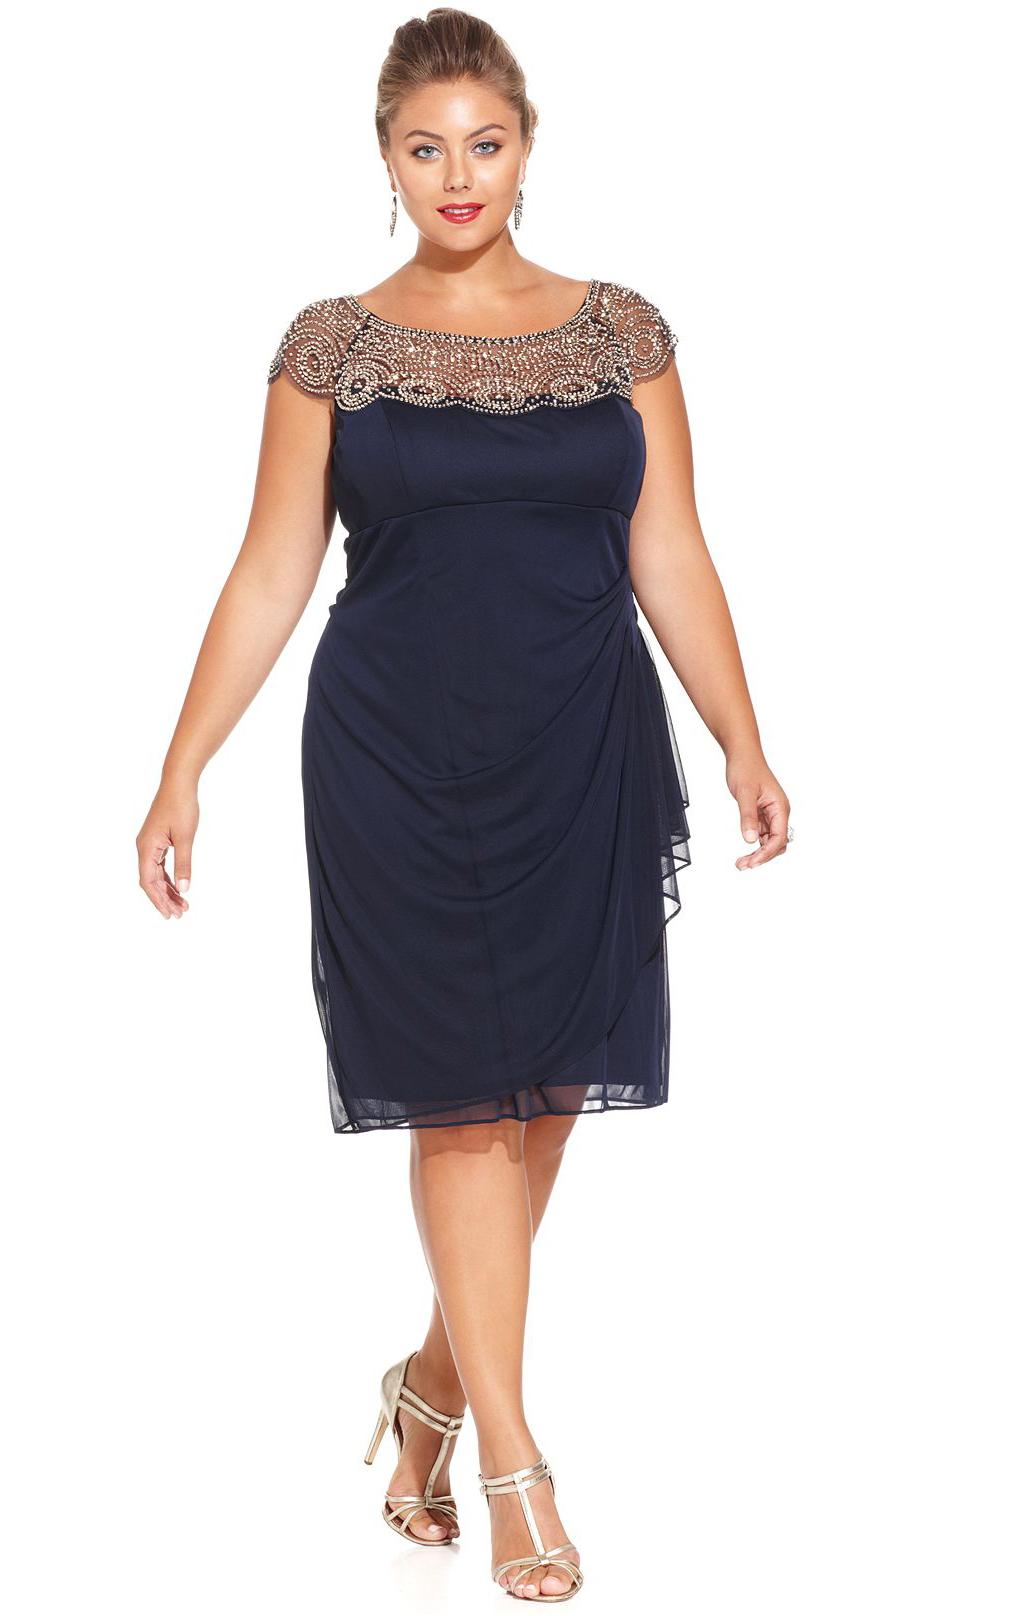 Plus size navy bridesmaid dresses uk plus size tops for Navy plus size dress for wedding